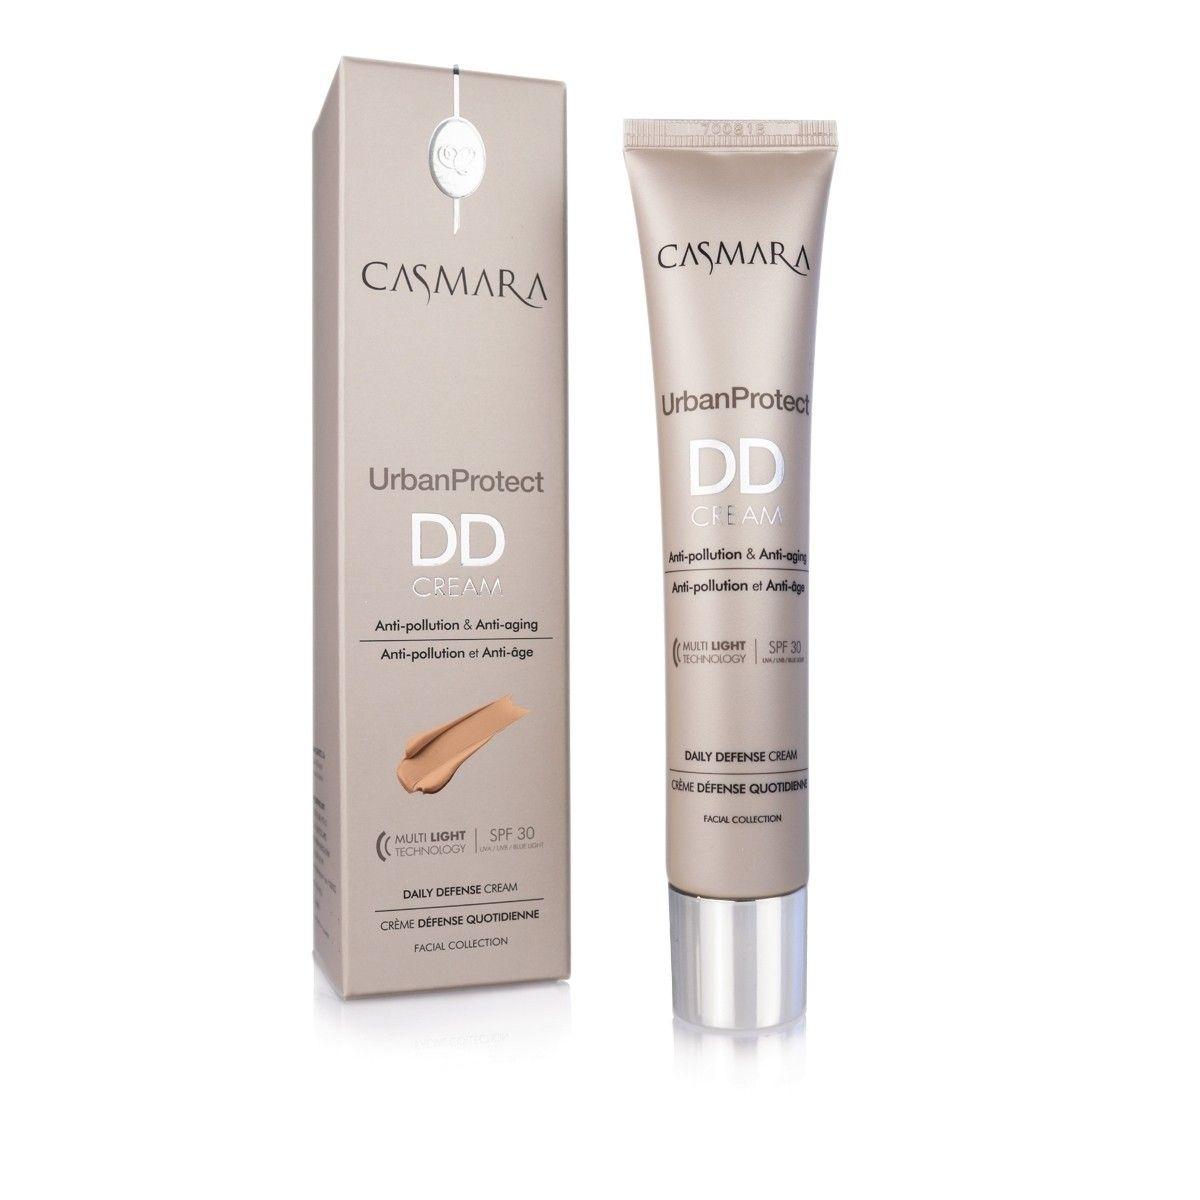 Afbeelding van Casmara Dd Cream Urban Protect Light UrbanProtect Beauty